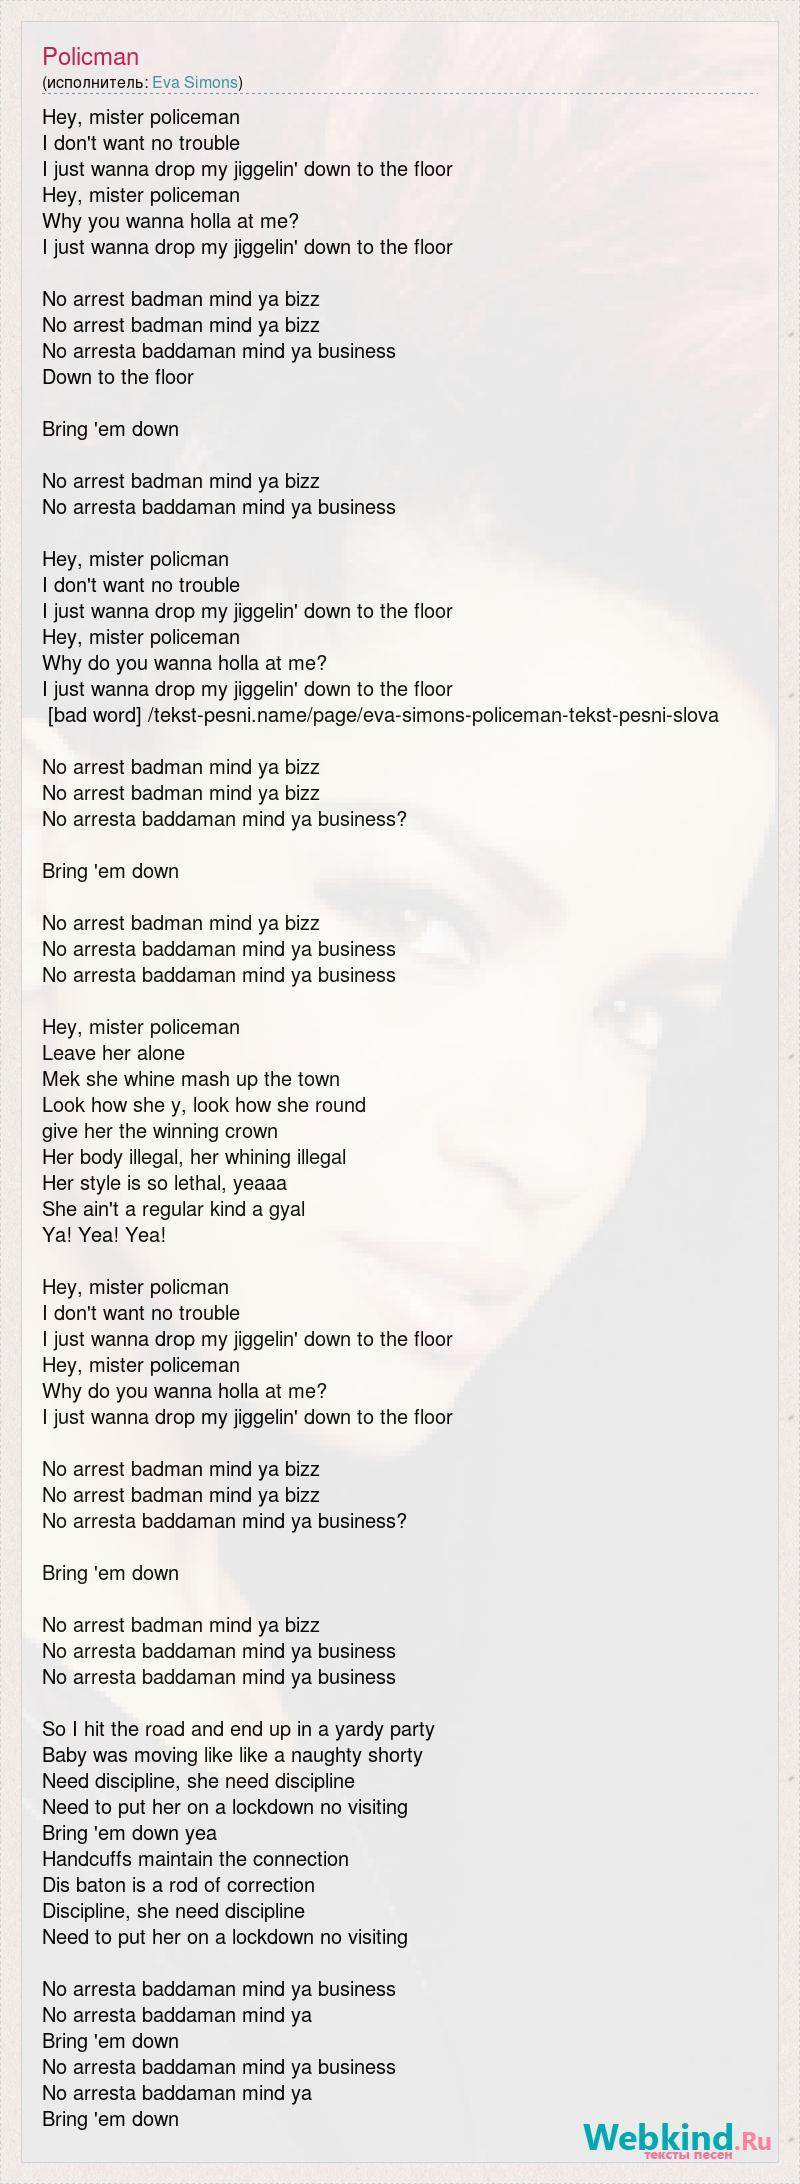 Текст песни Policman, слова песни